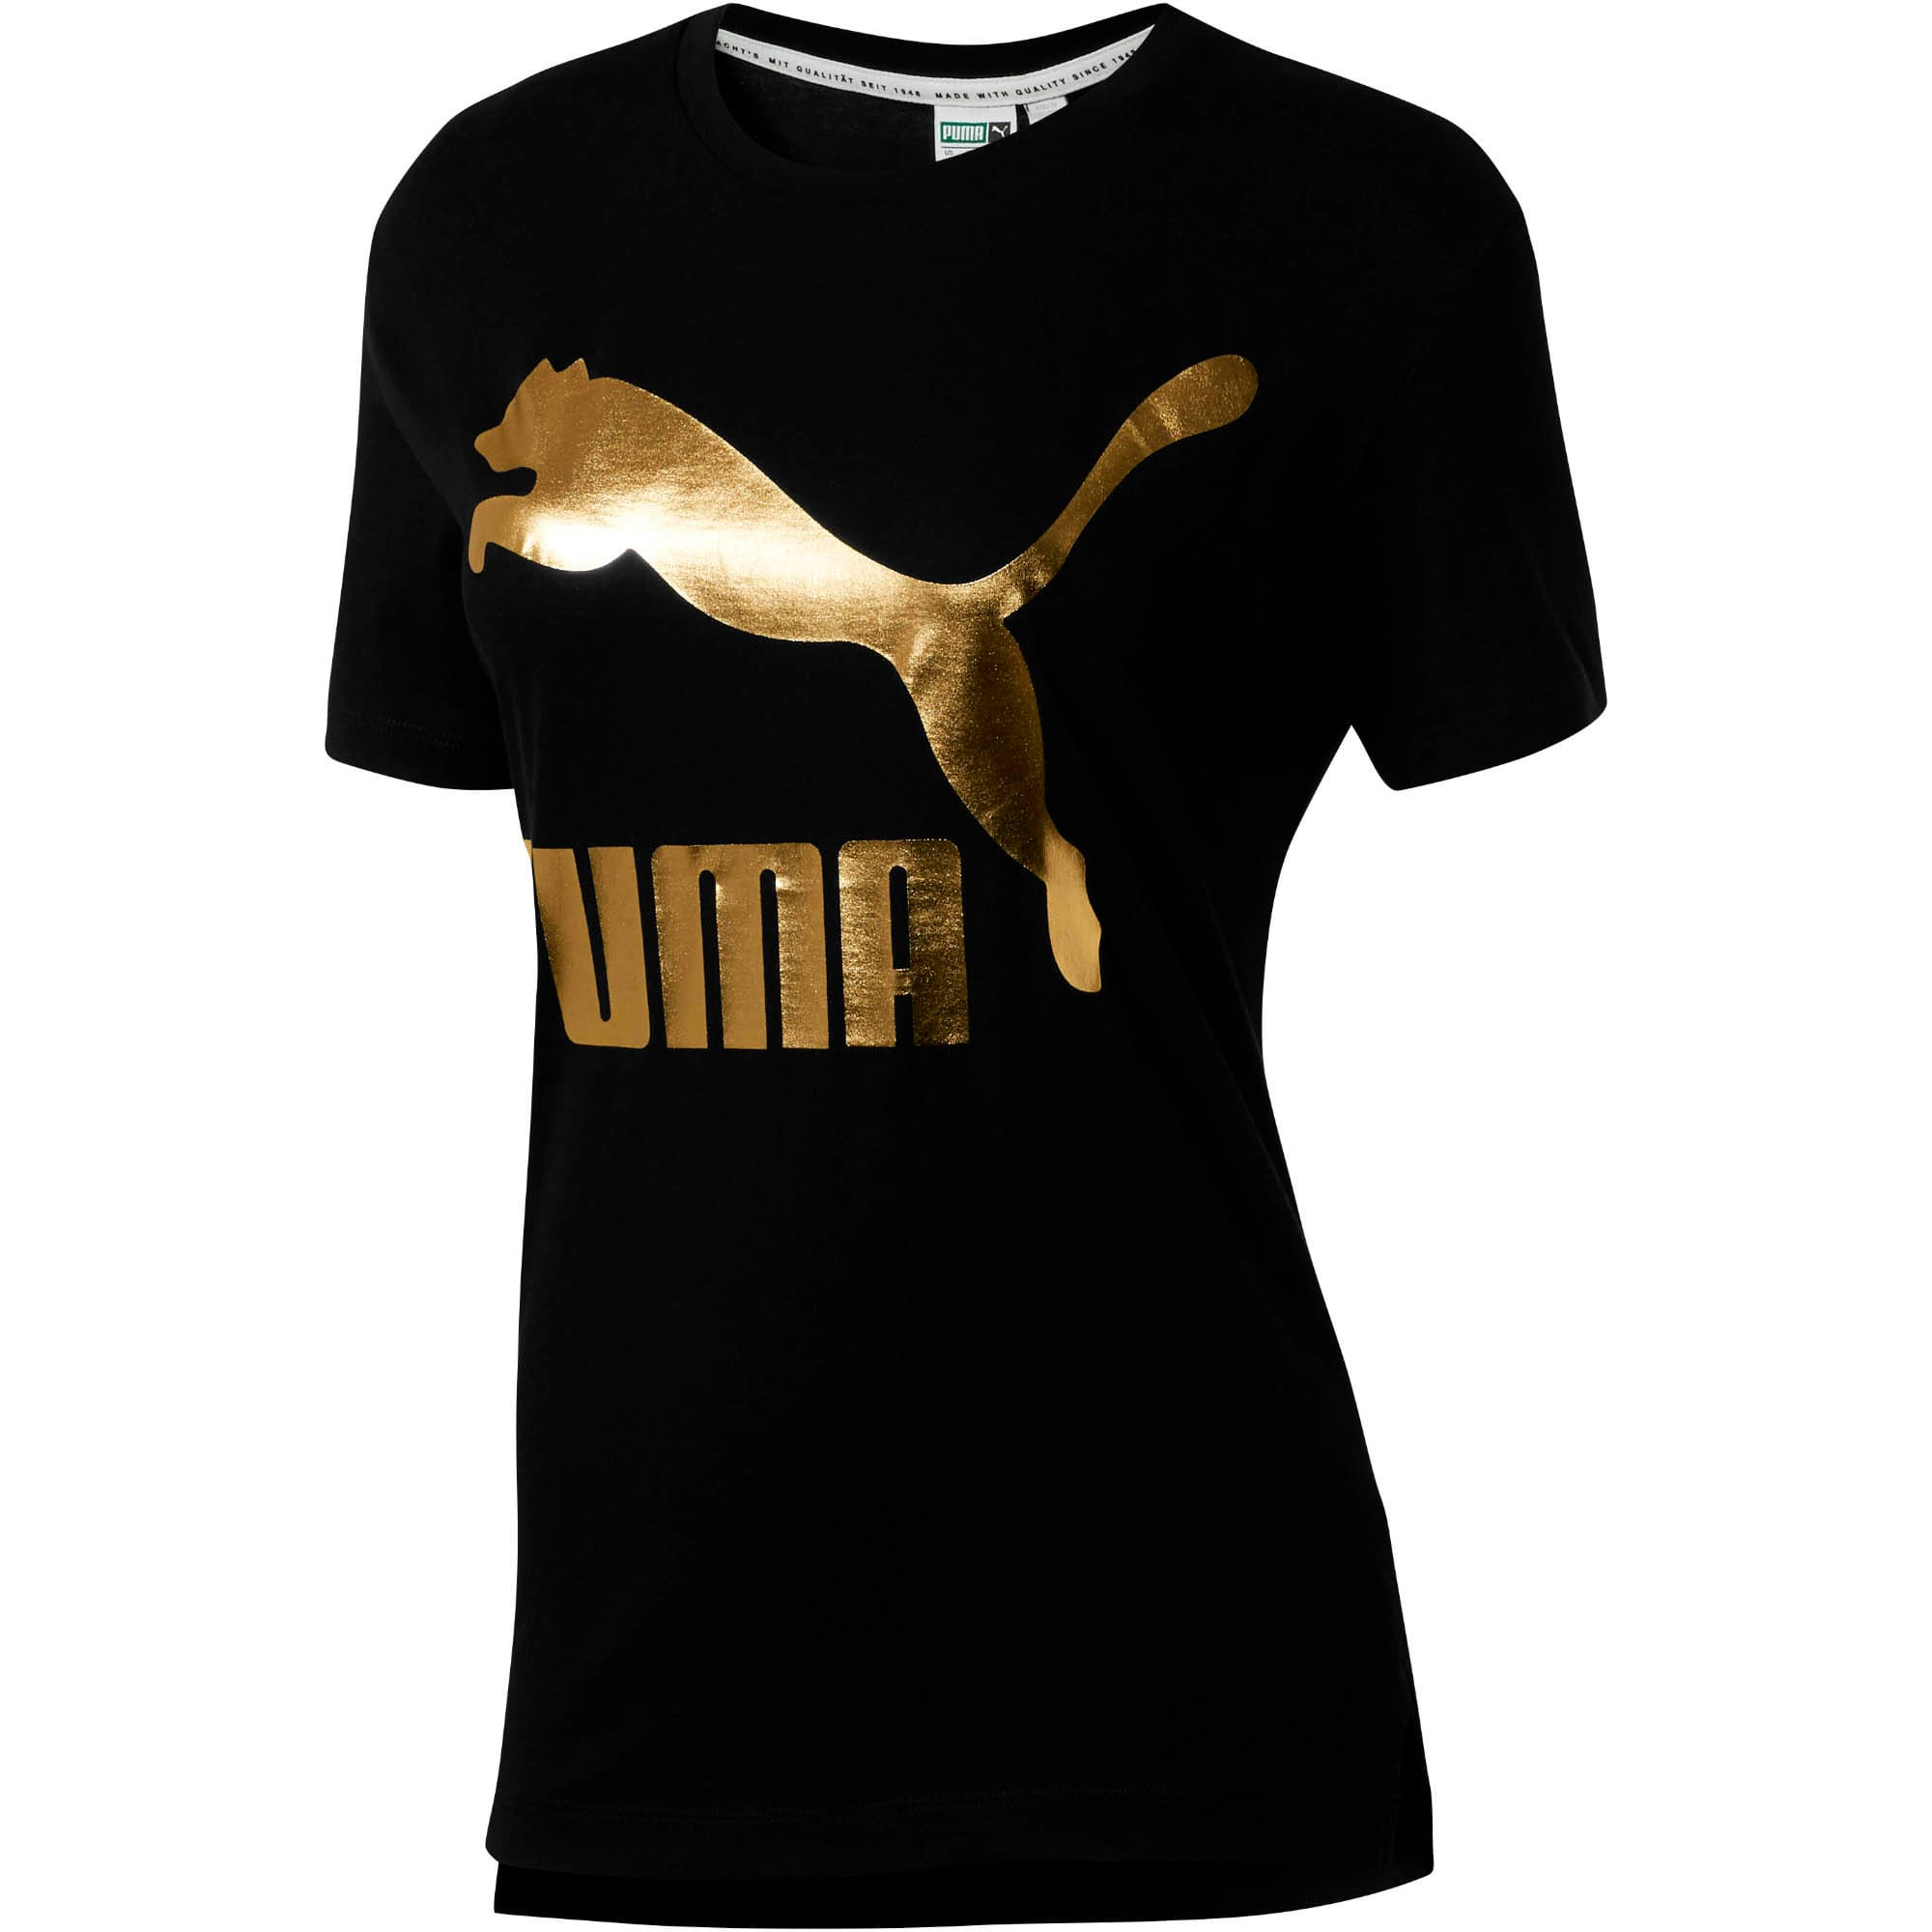 Miniatura 2 de Camiseta Classics con logotipo para mujer, Cotton Black-gold, mediano